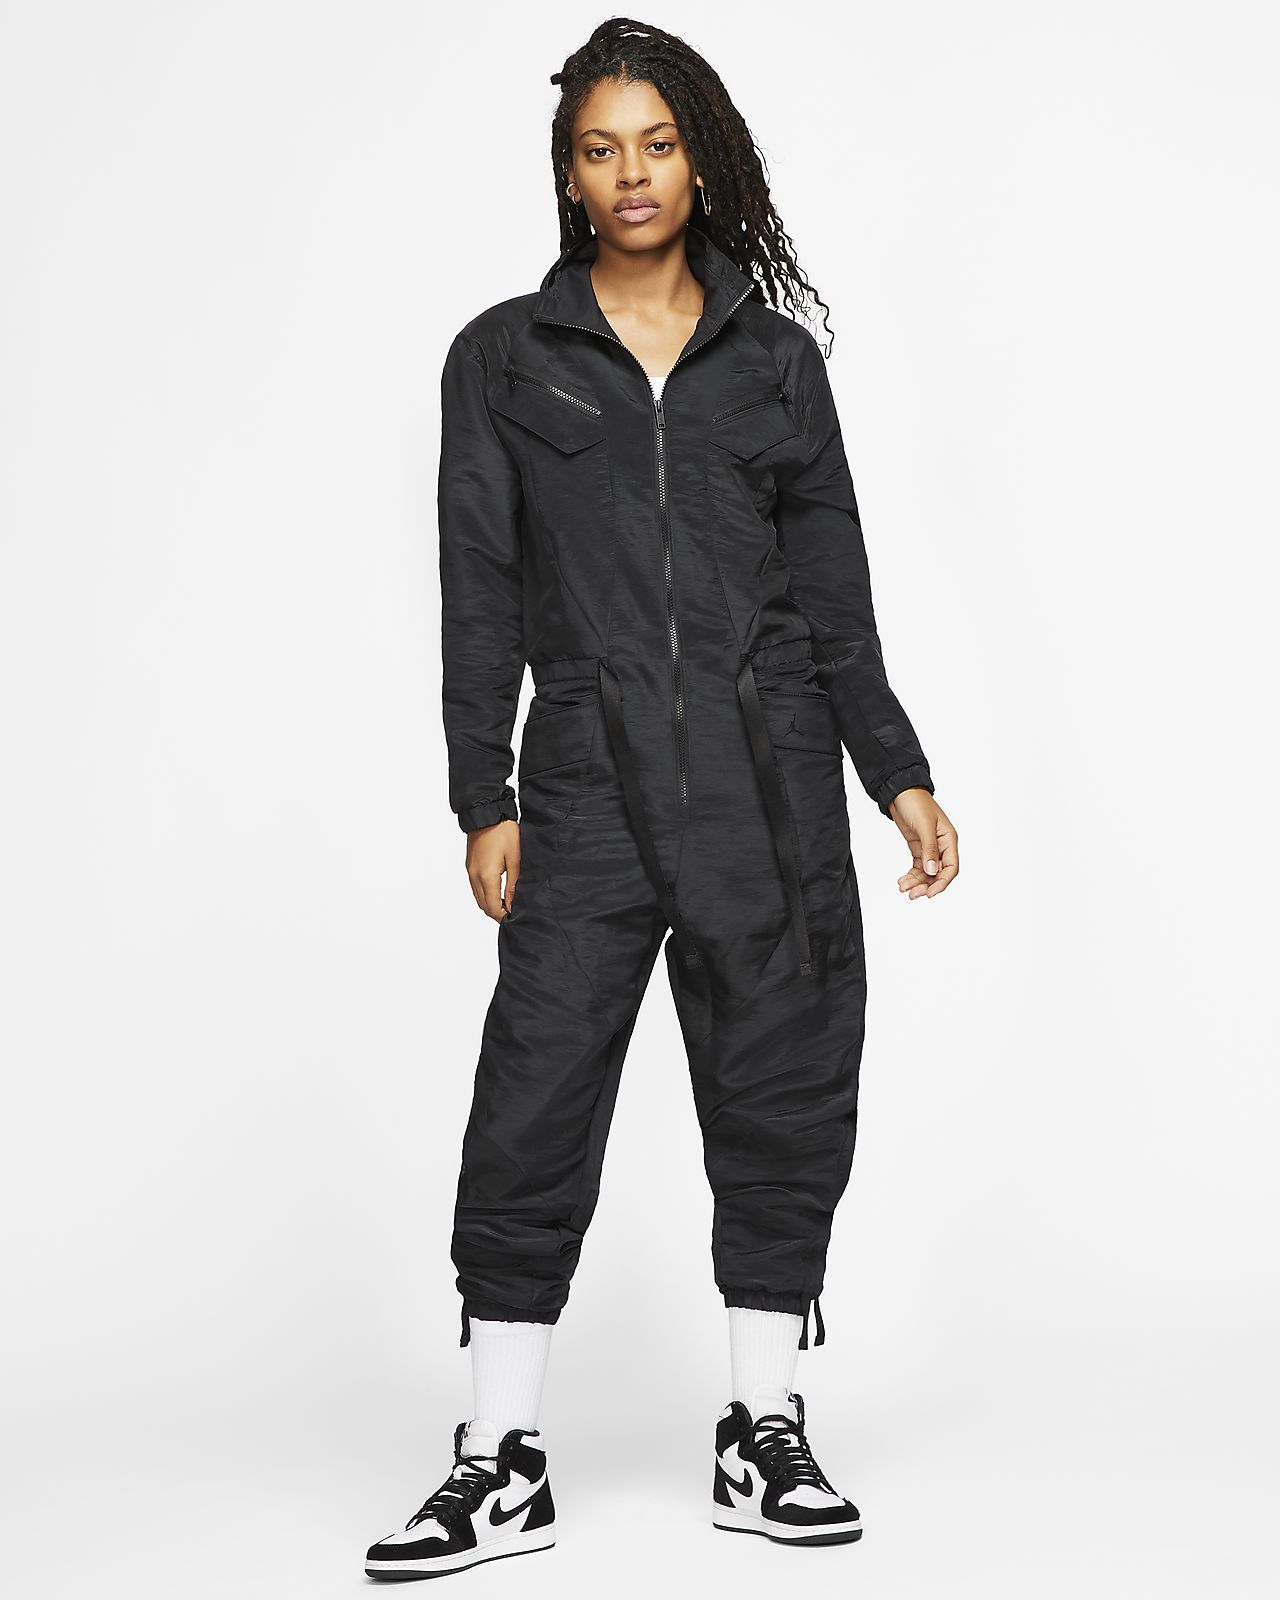 Flight Suit Jordan para mulher